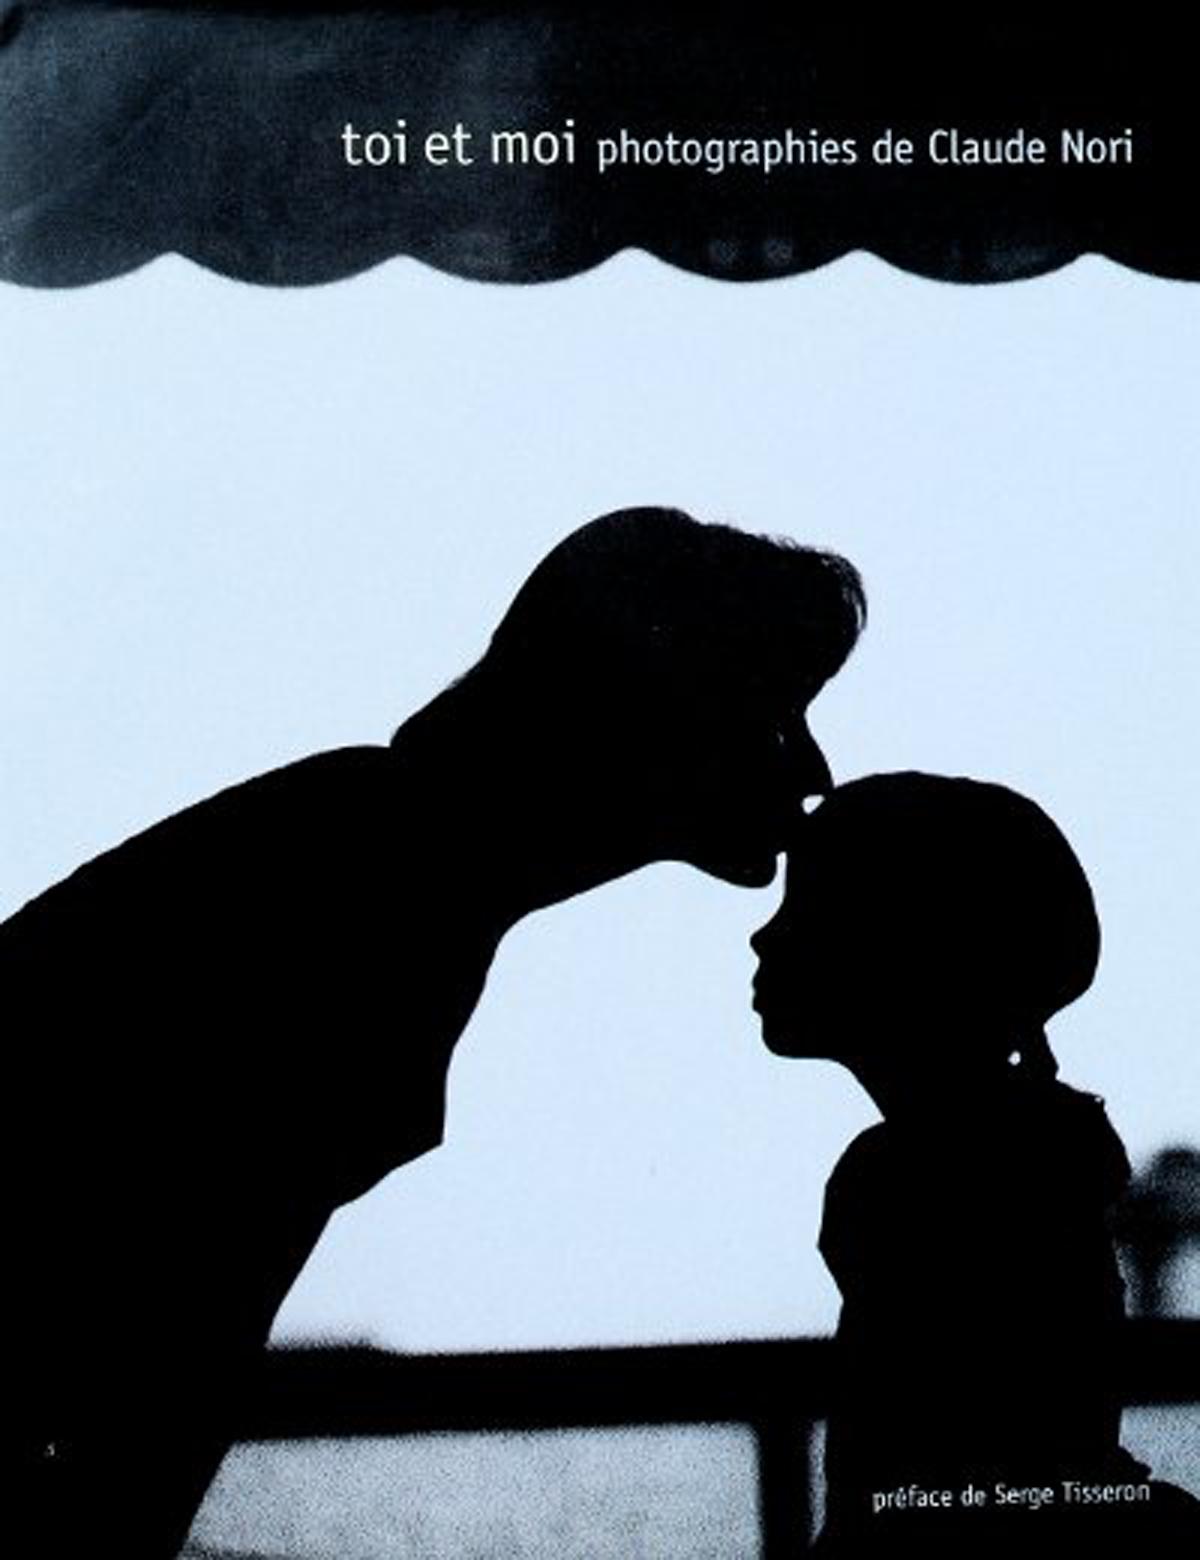 Toi et moi, photographies de Claude Nori